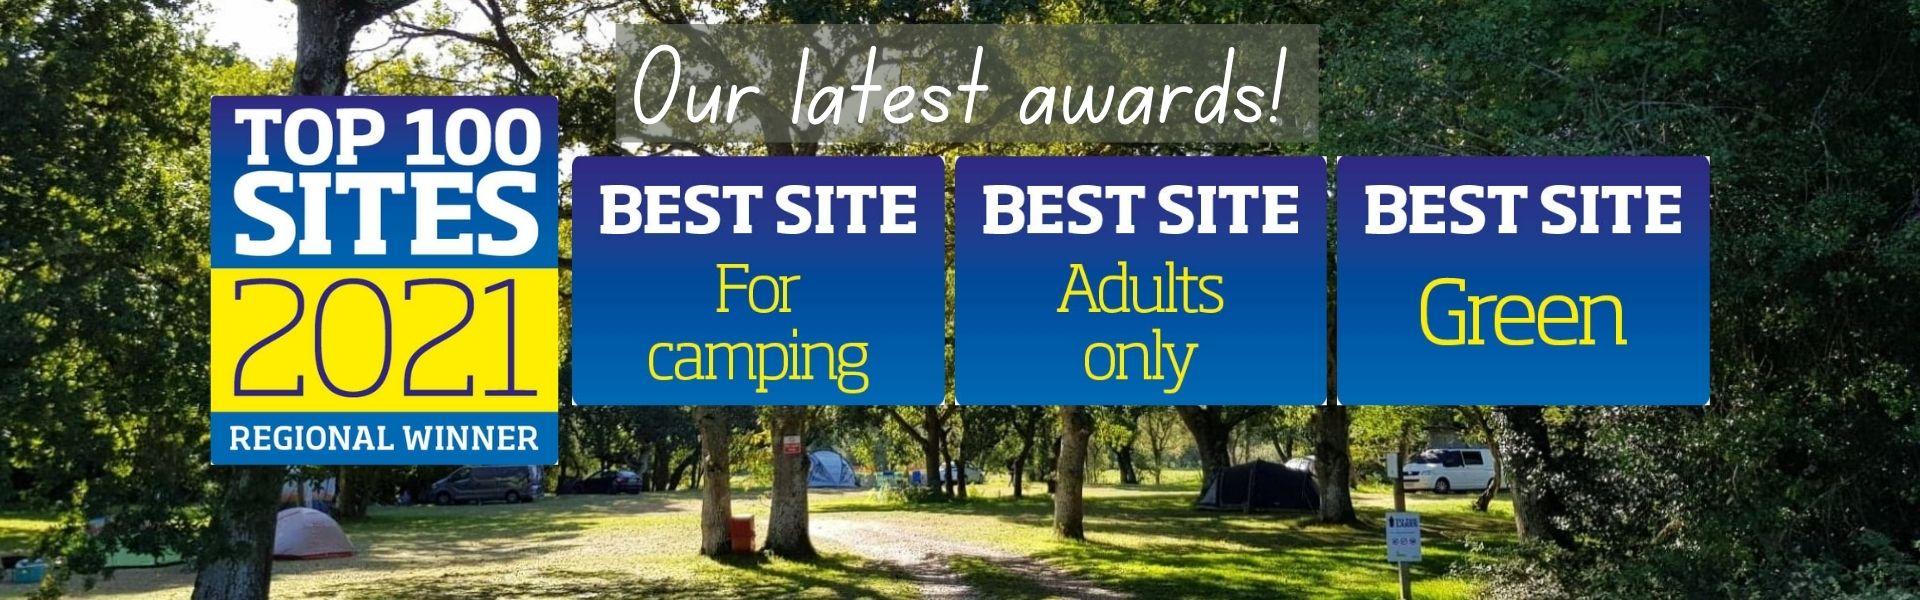 Latest-awards-Top100-21-1920x600